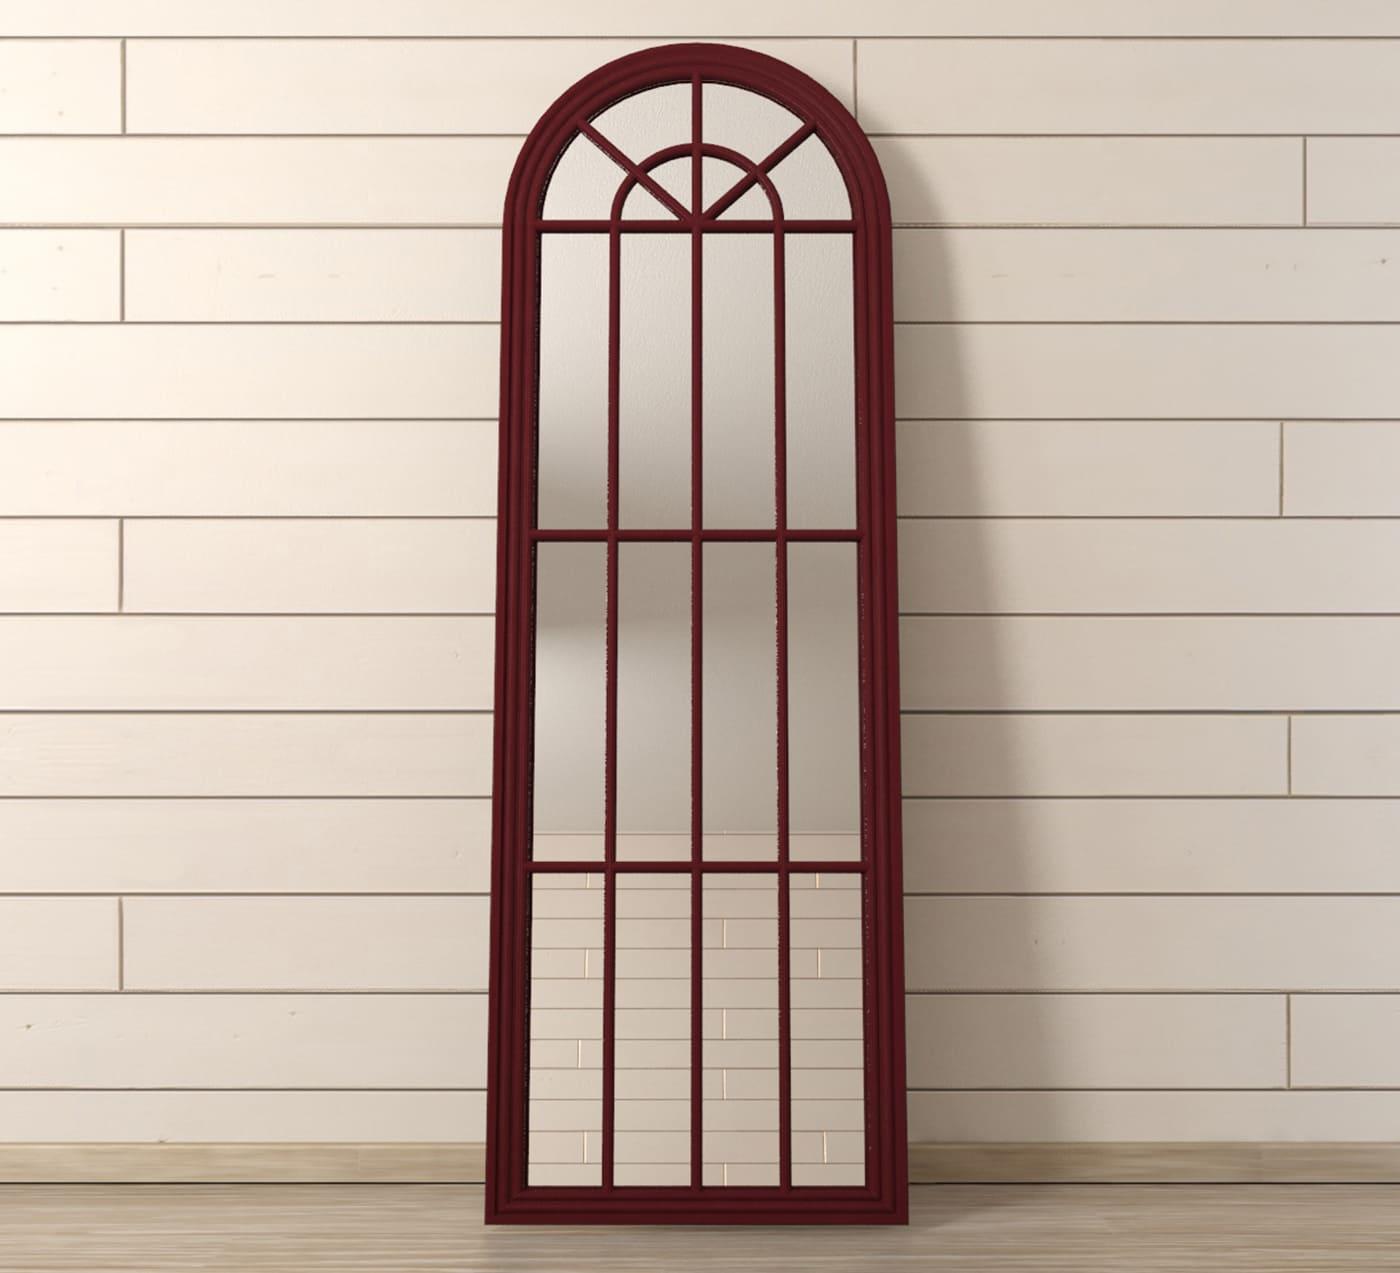 На фото: фальш-окно в виде зеркала